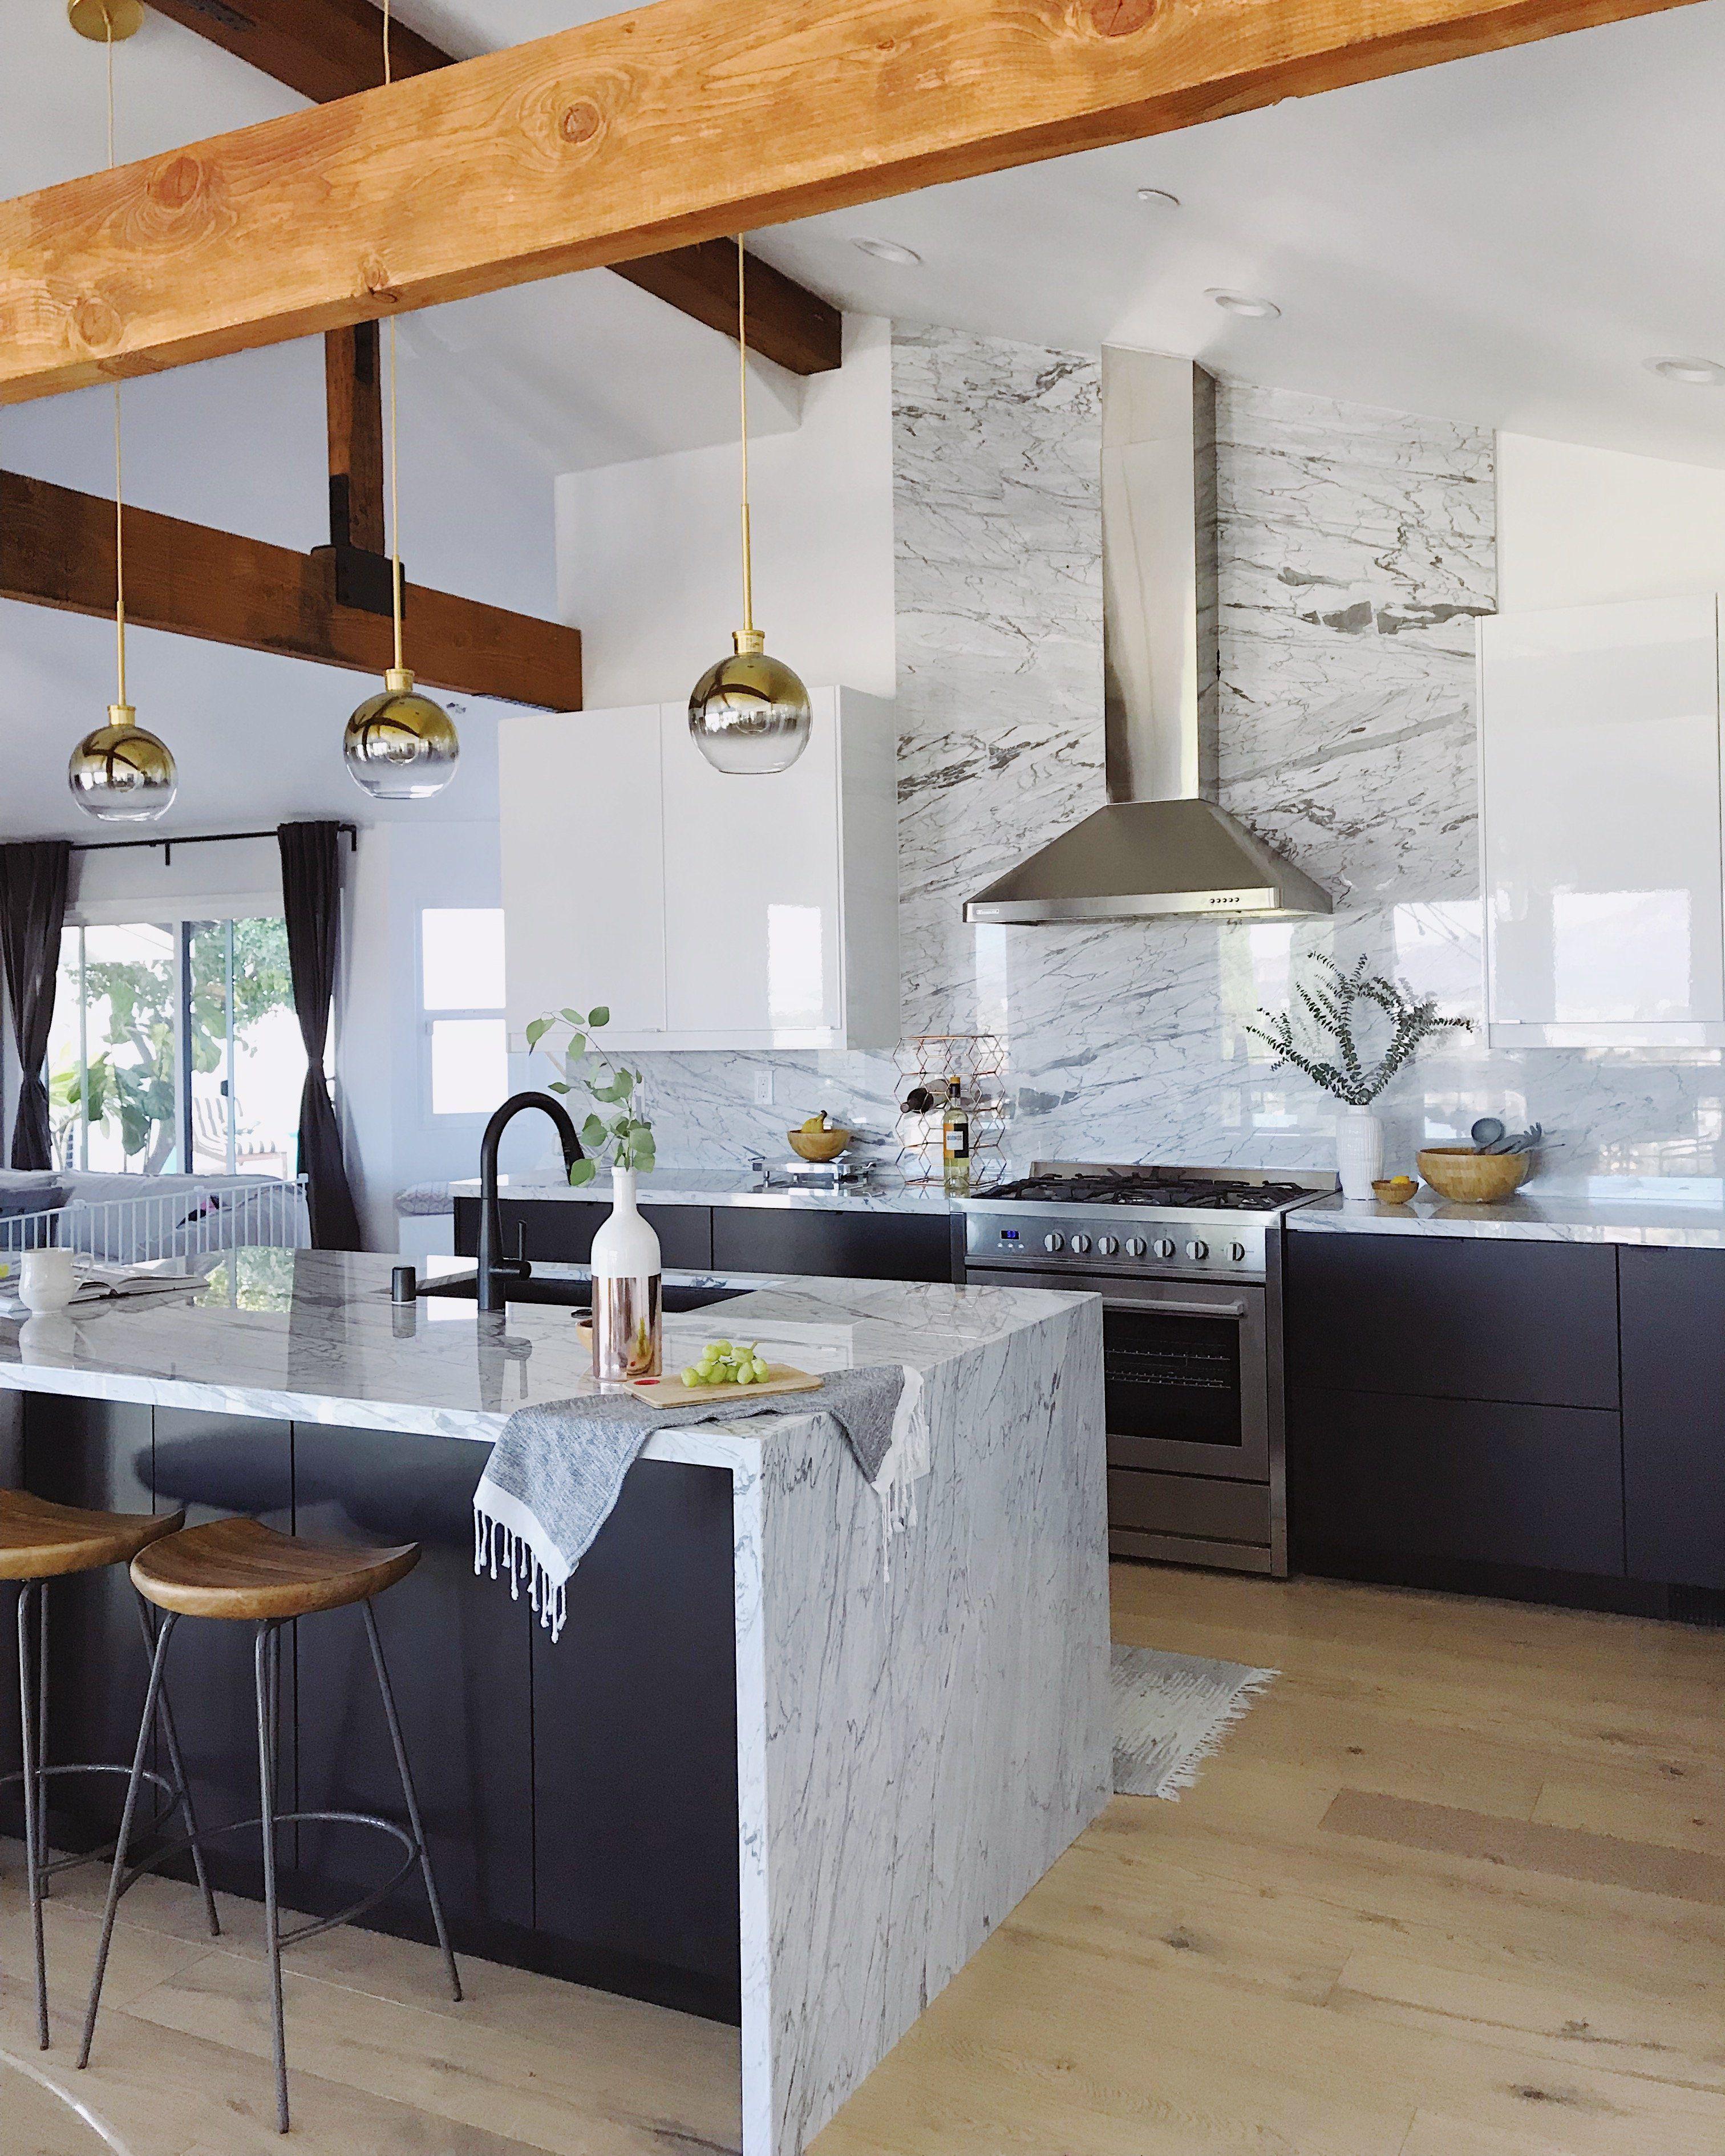 Amazing Black And White Kitchen With Marble Backsplash In 2020 White Marble Kitchen Contemporary Kitchen Design Ikea Kitchen Design